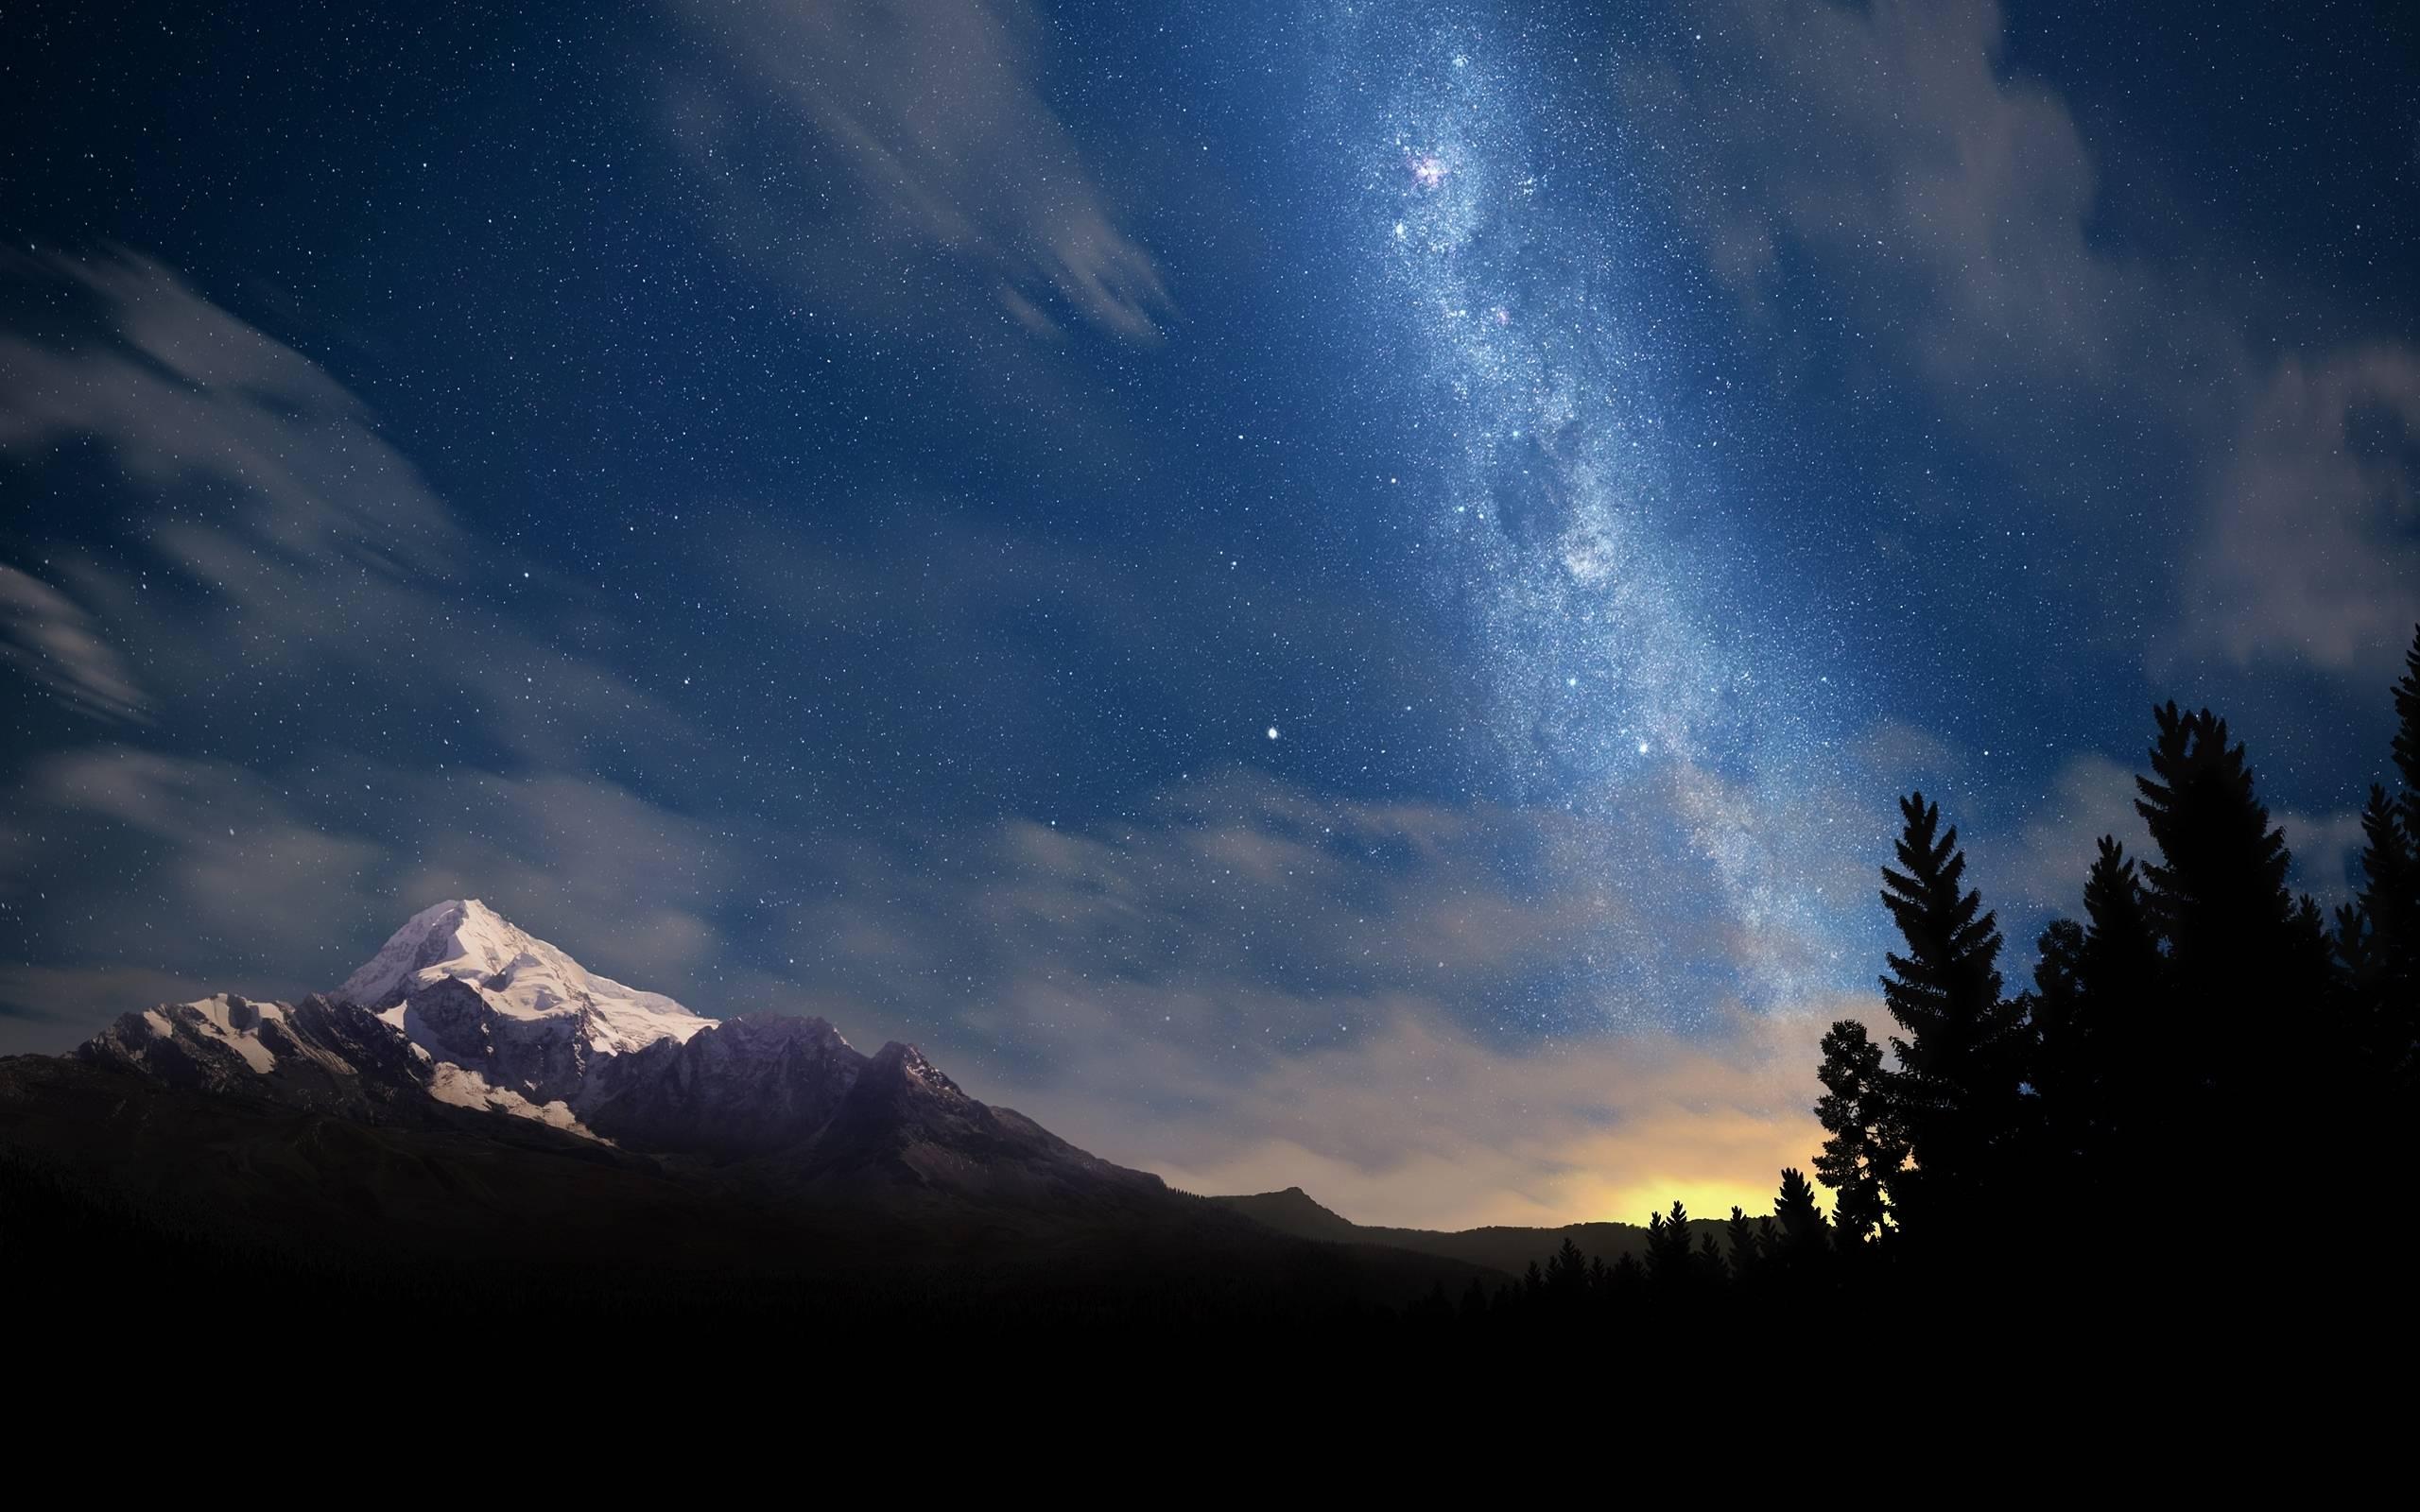 40 best free stars desktop wallpapers - wallpaperaccess